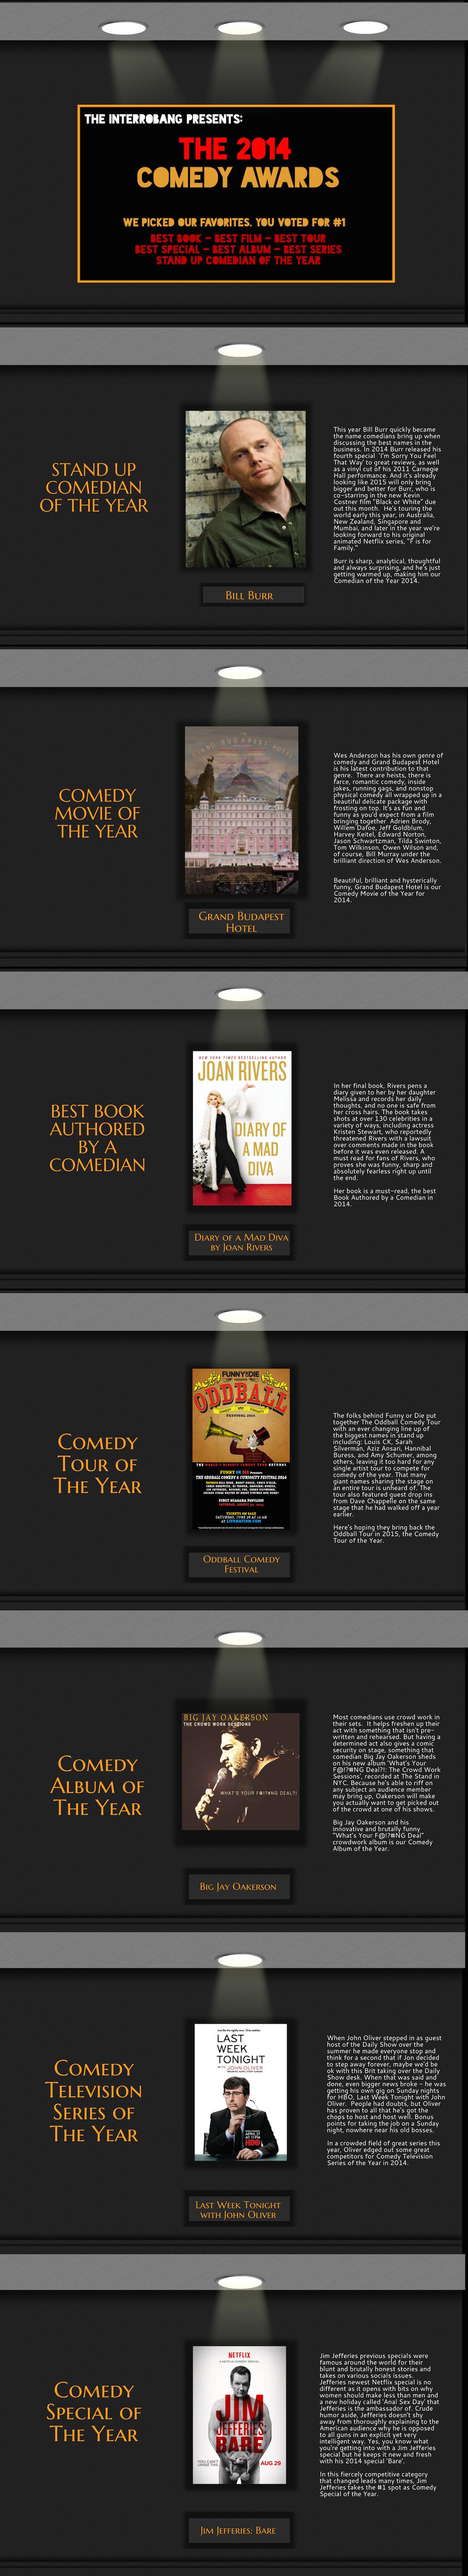 2014 final comedy awards